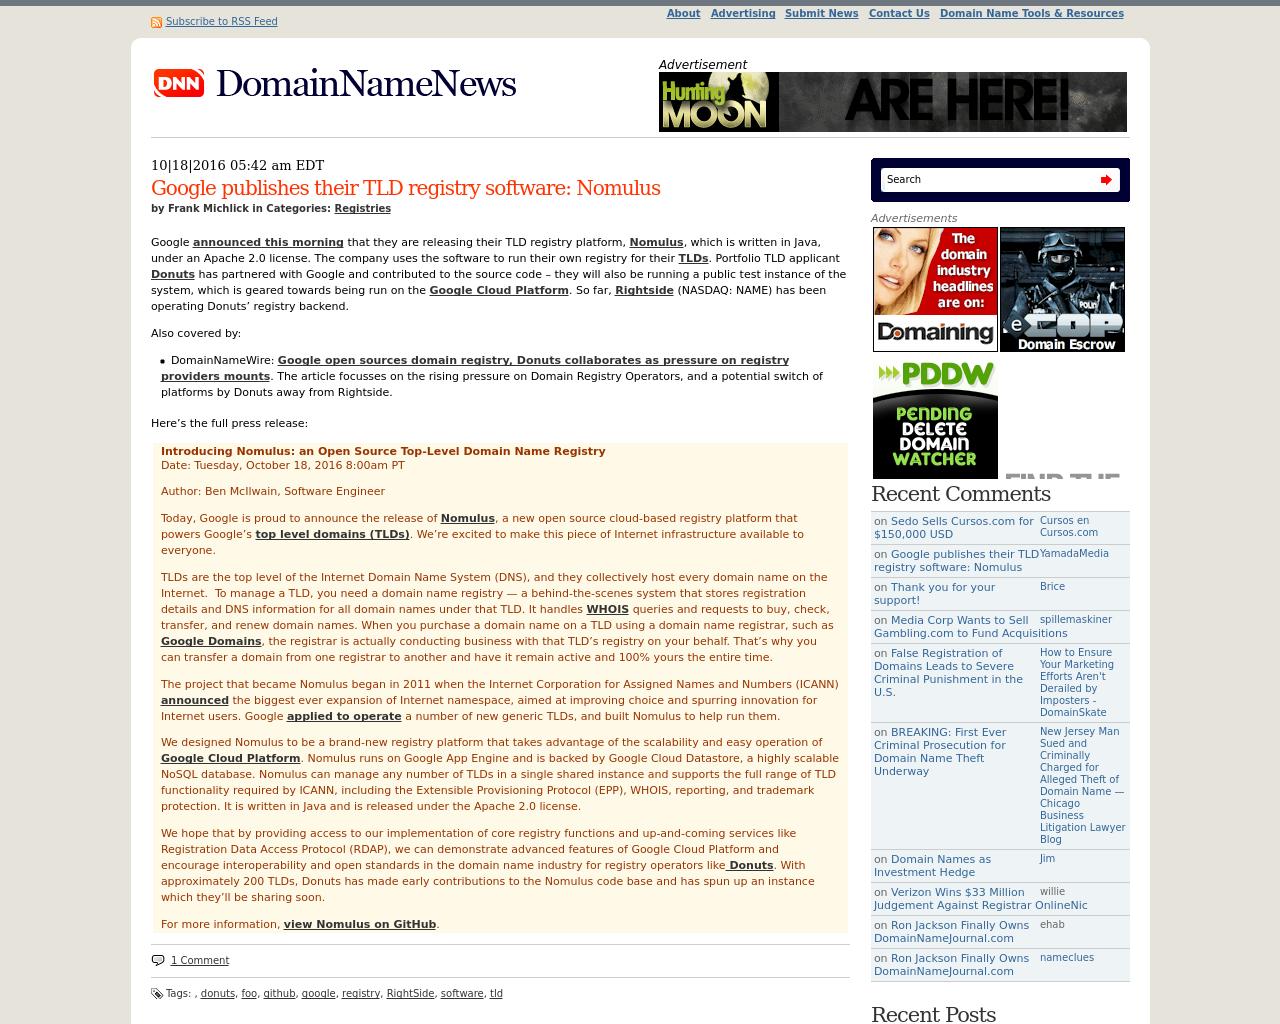 DomainNameNews-Advertising-Reviews-Pricing